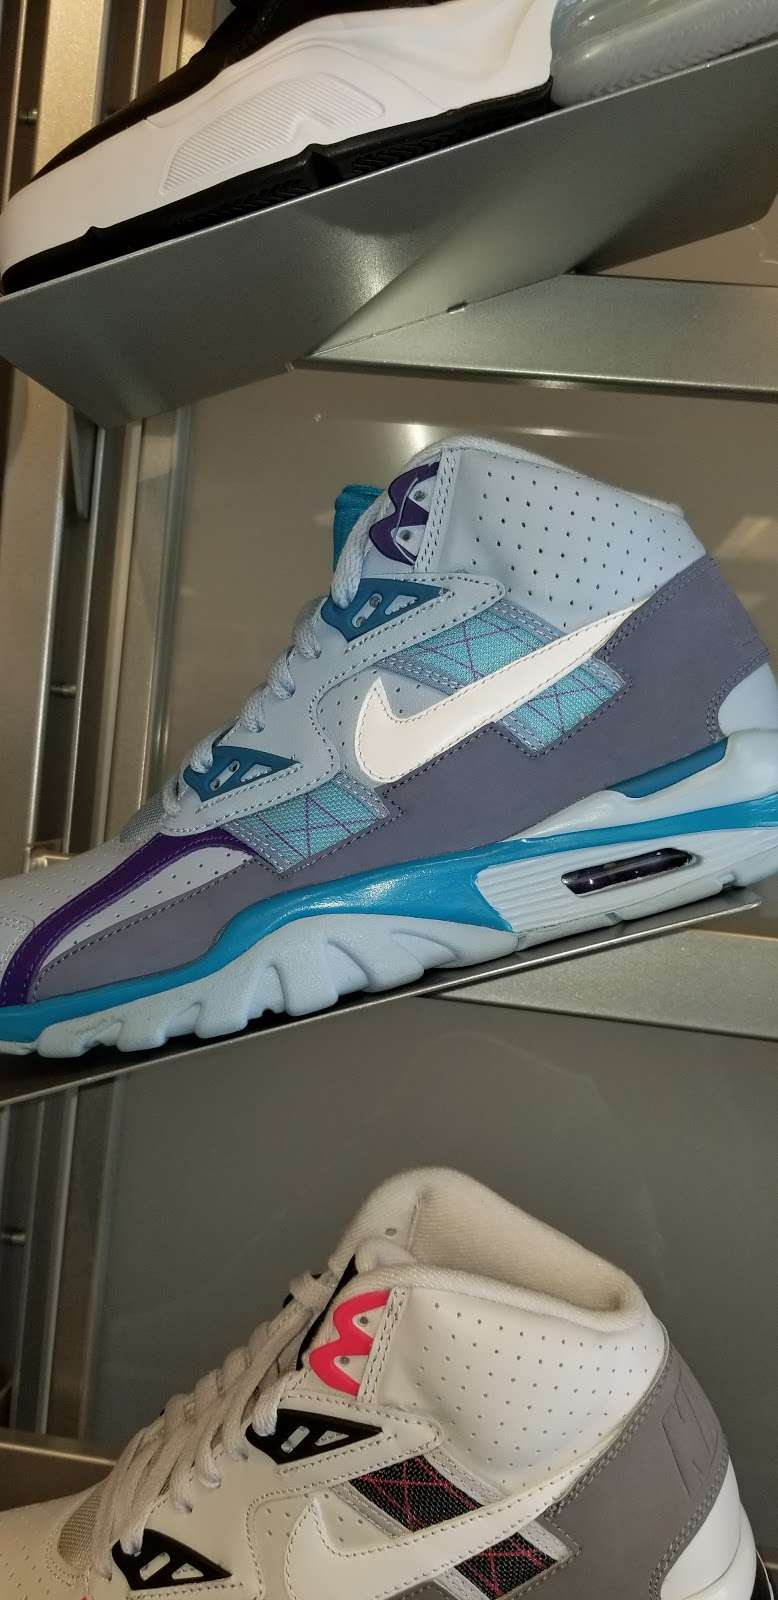 DTLR - shoe store  | Photo 4 of 4 | Address: 8160 Ikea Blvd SPACE 2B, Charlotte, NC 28262, USA | Phone: (704) 598-8491